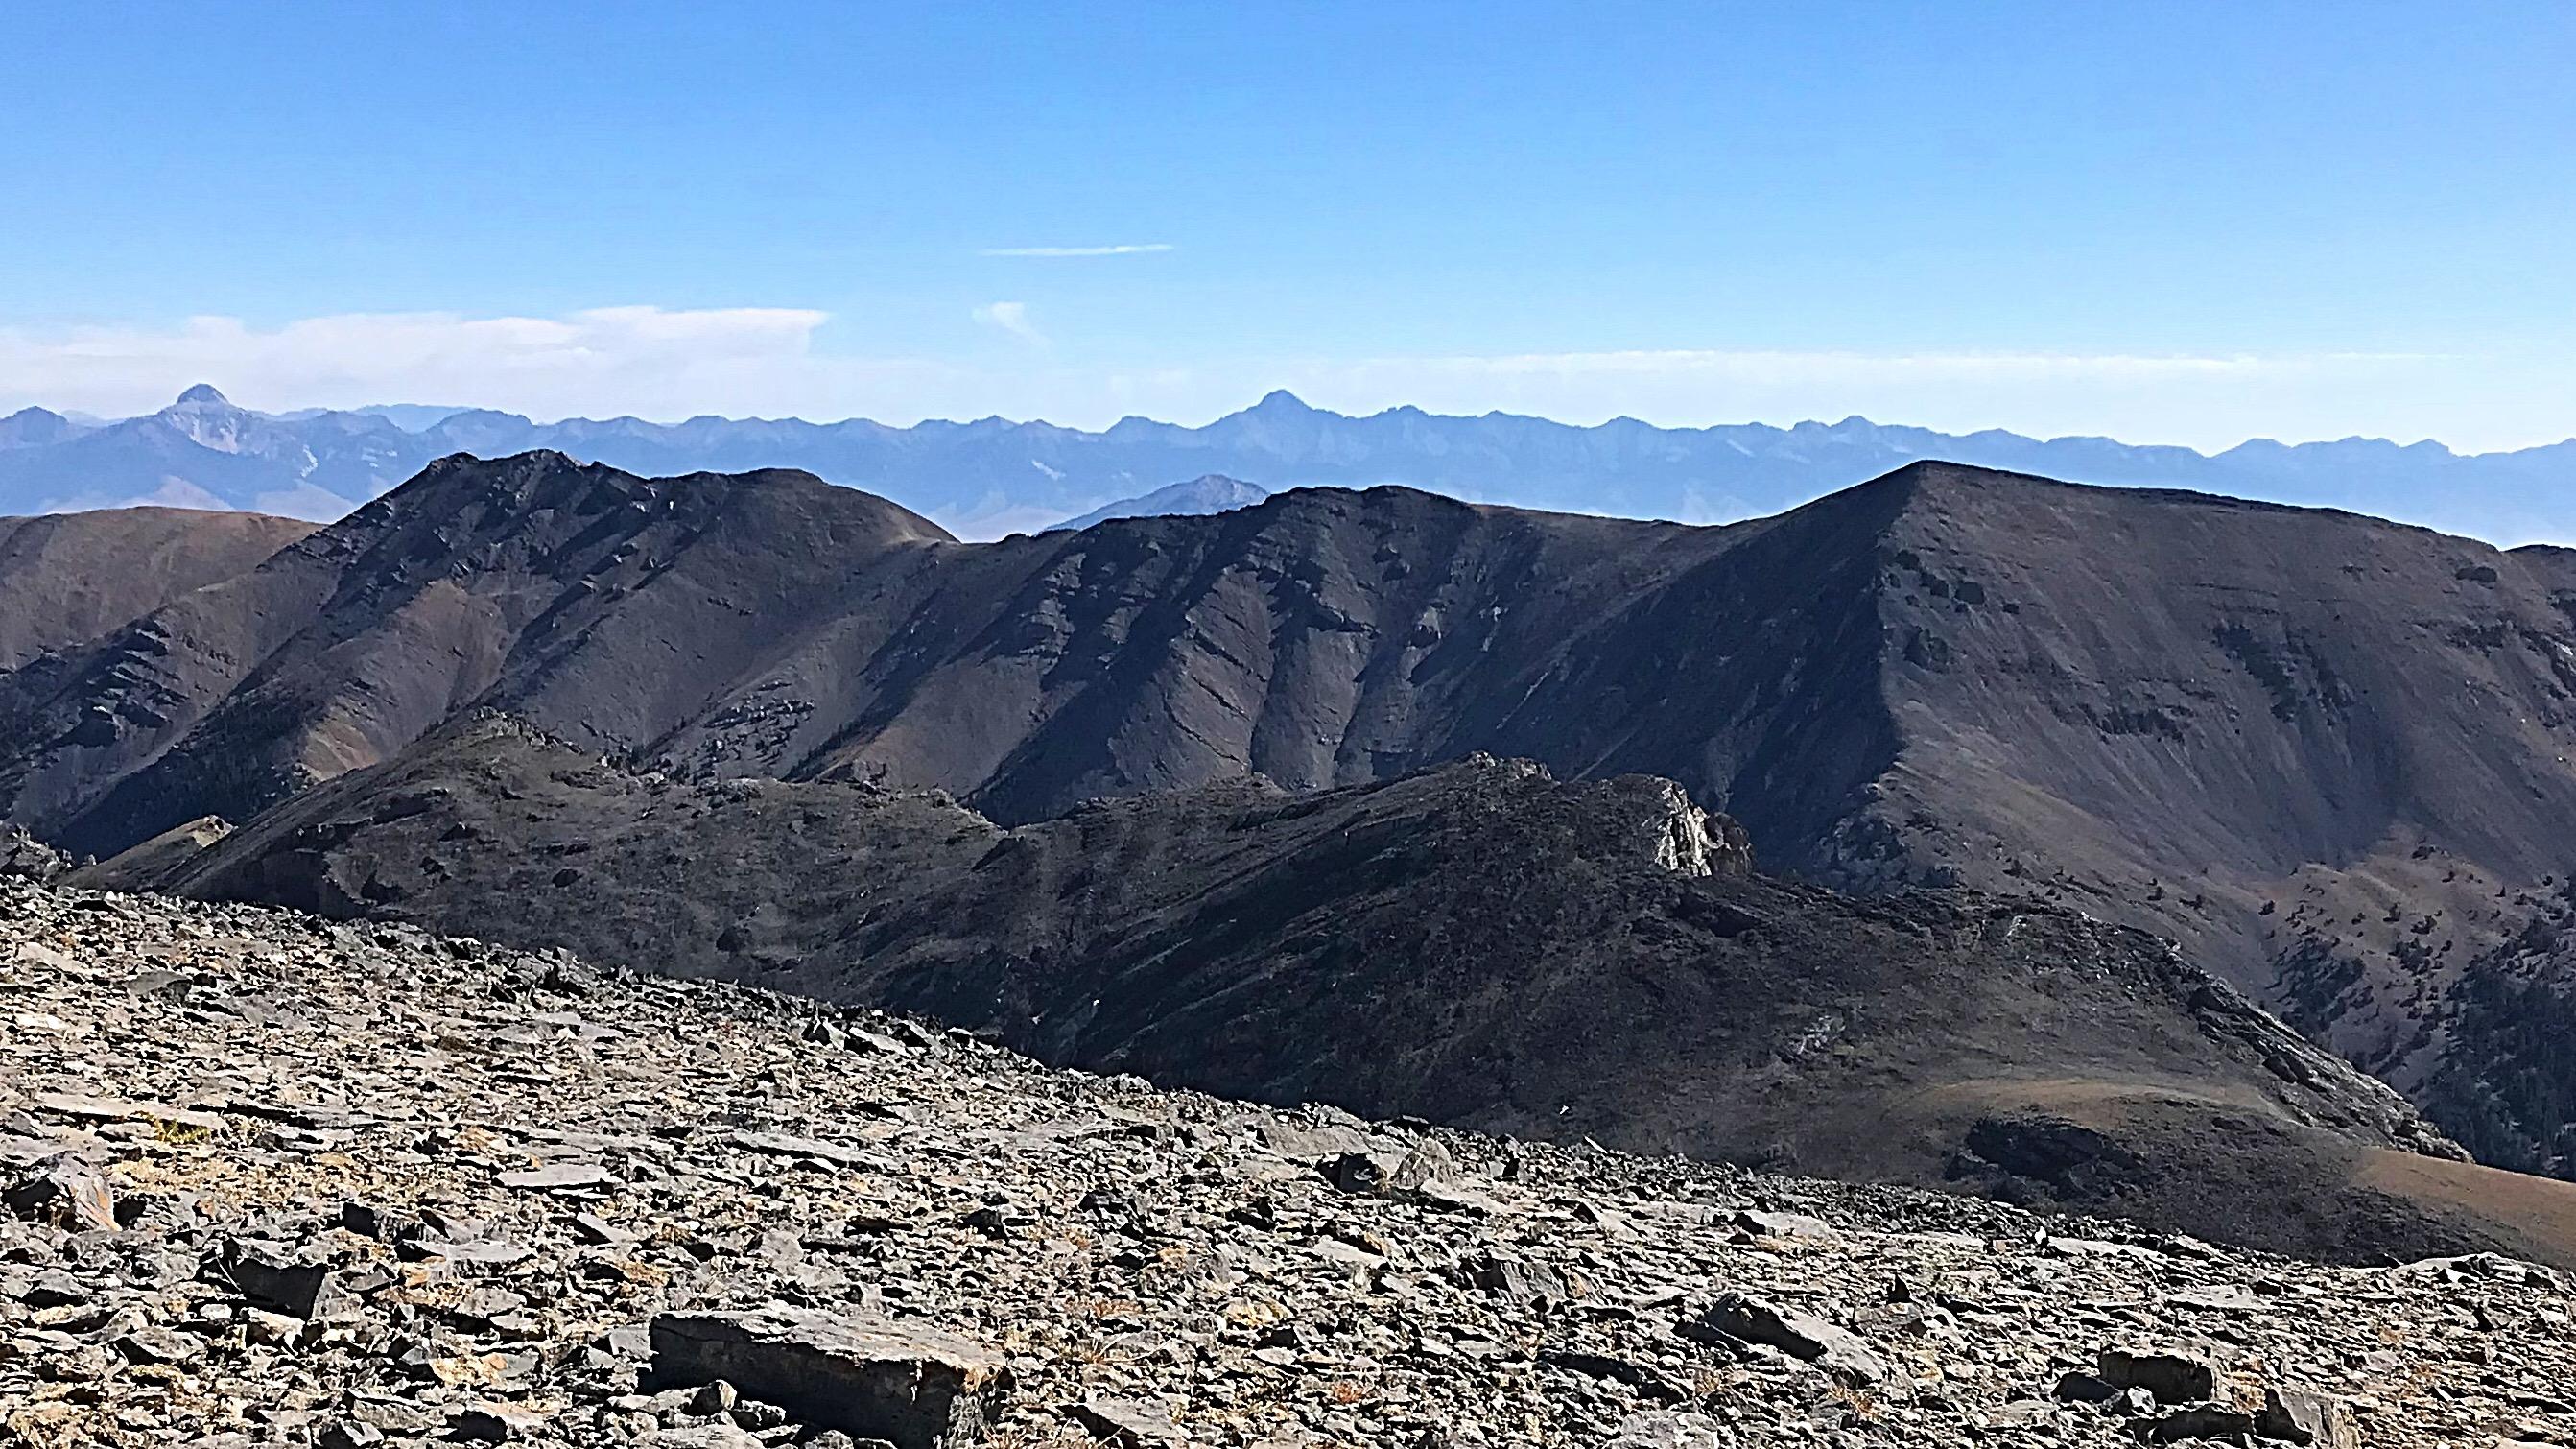 Massacre Mountain viewed from the southeast ridge of Ferguson Peak. North Massacre Mountain is on the left.